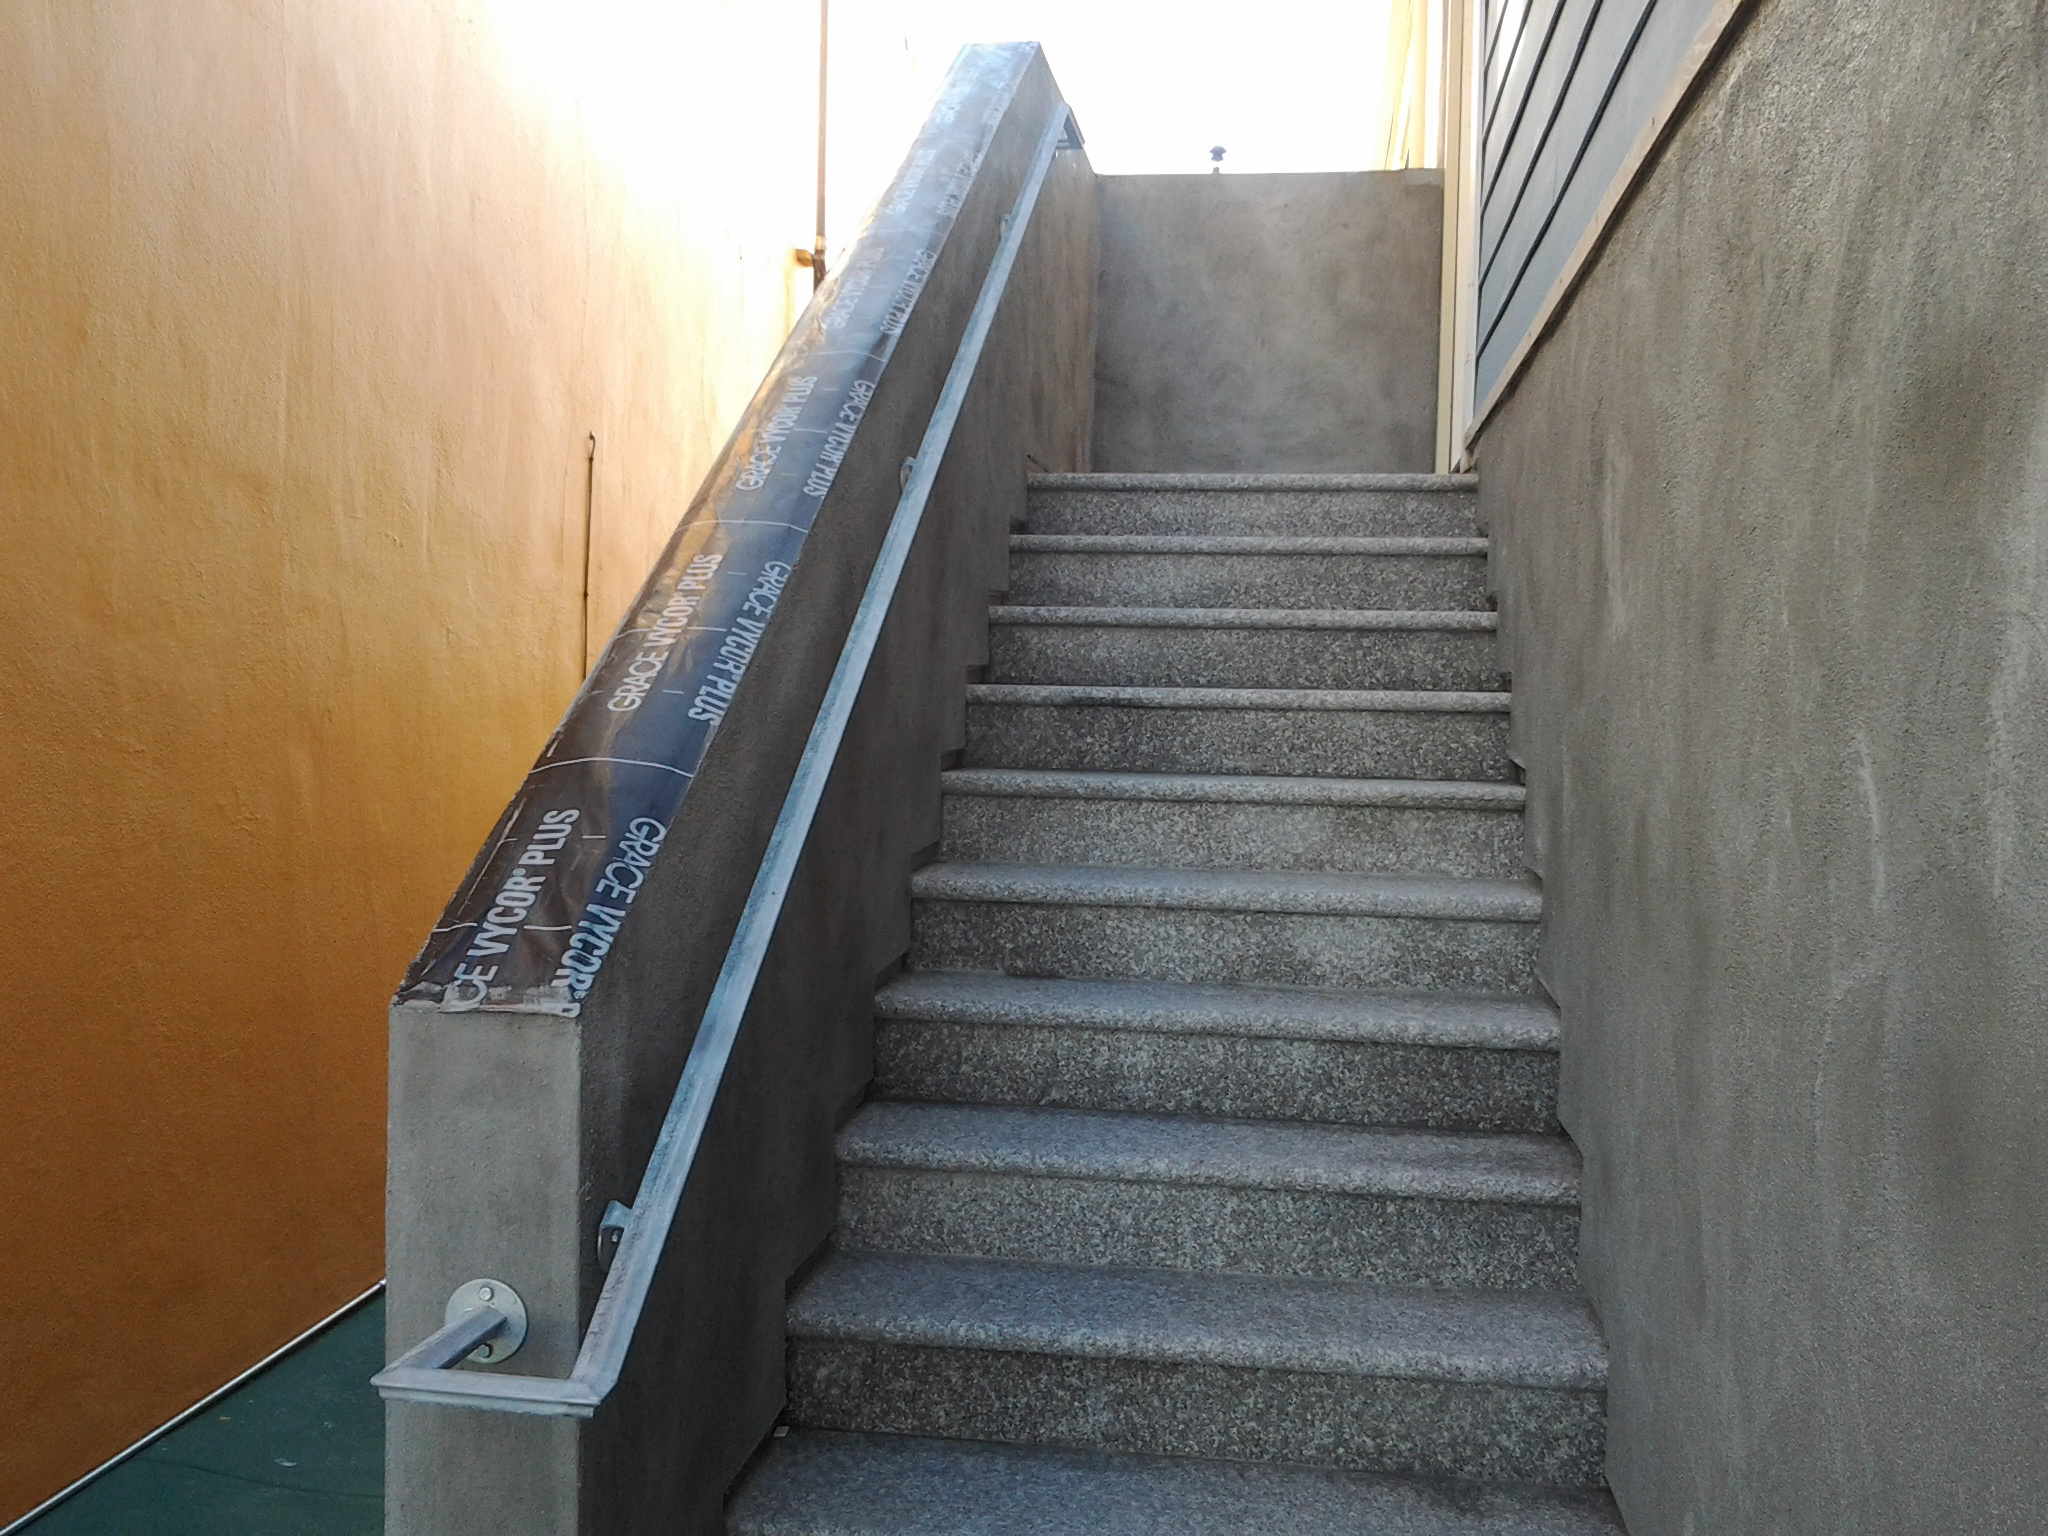 Handrail Example 2 (Molded Tube, sometimes referred to as Mushroom Shape)